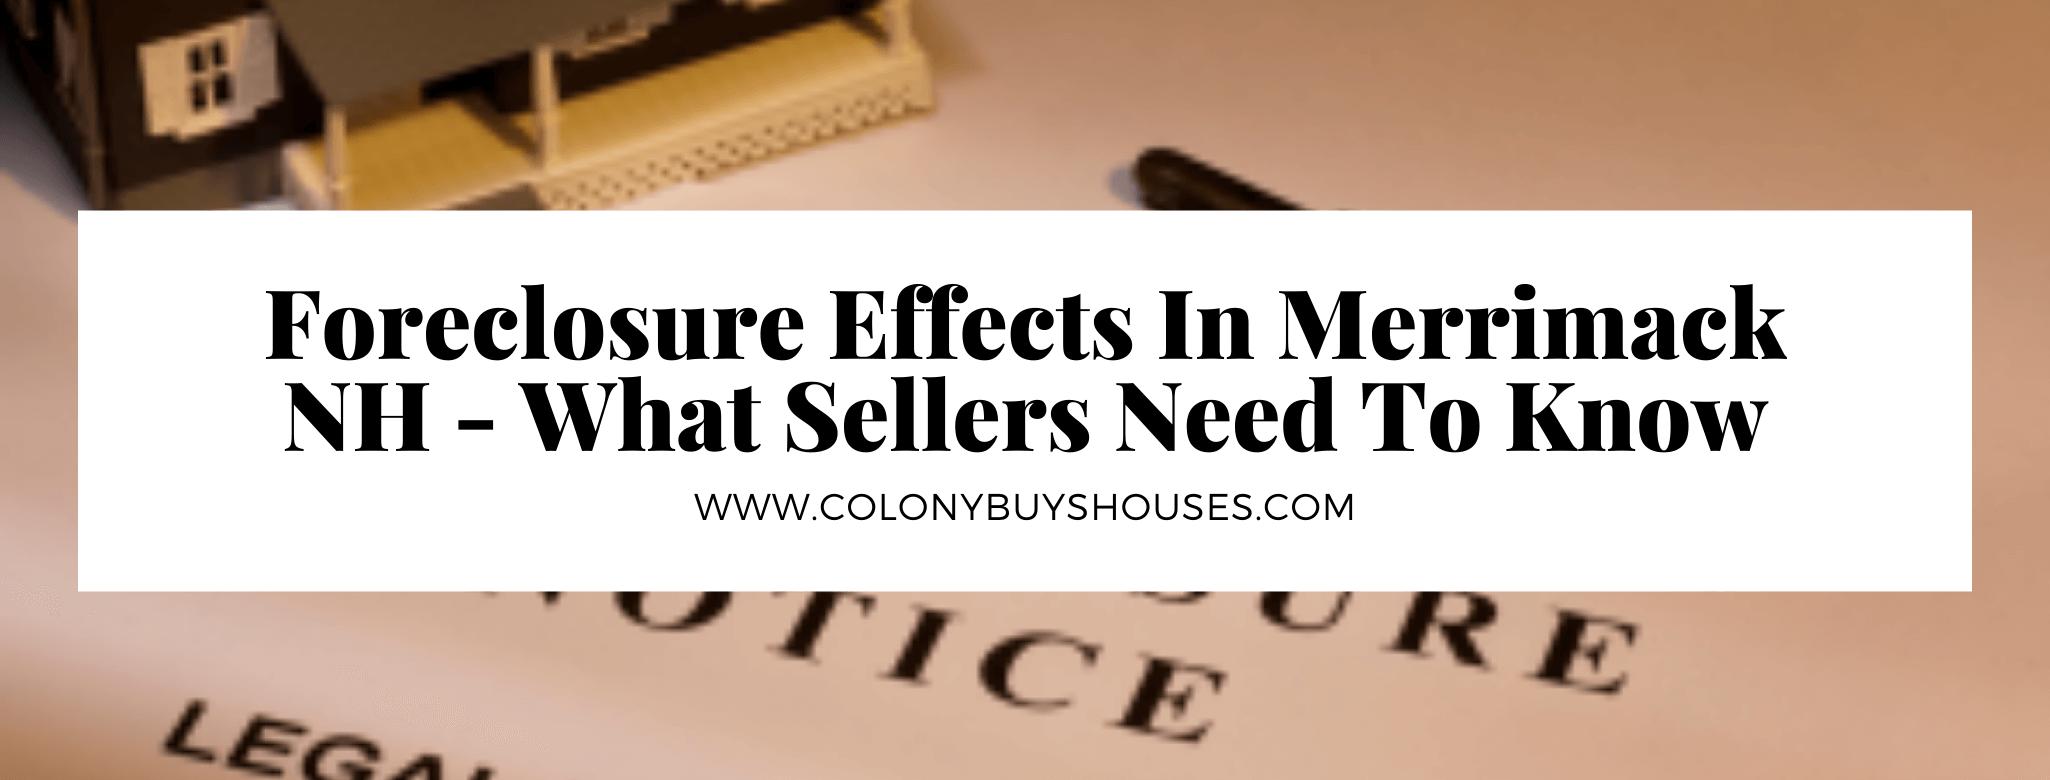 Merrimack NH house buyers